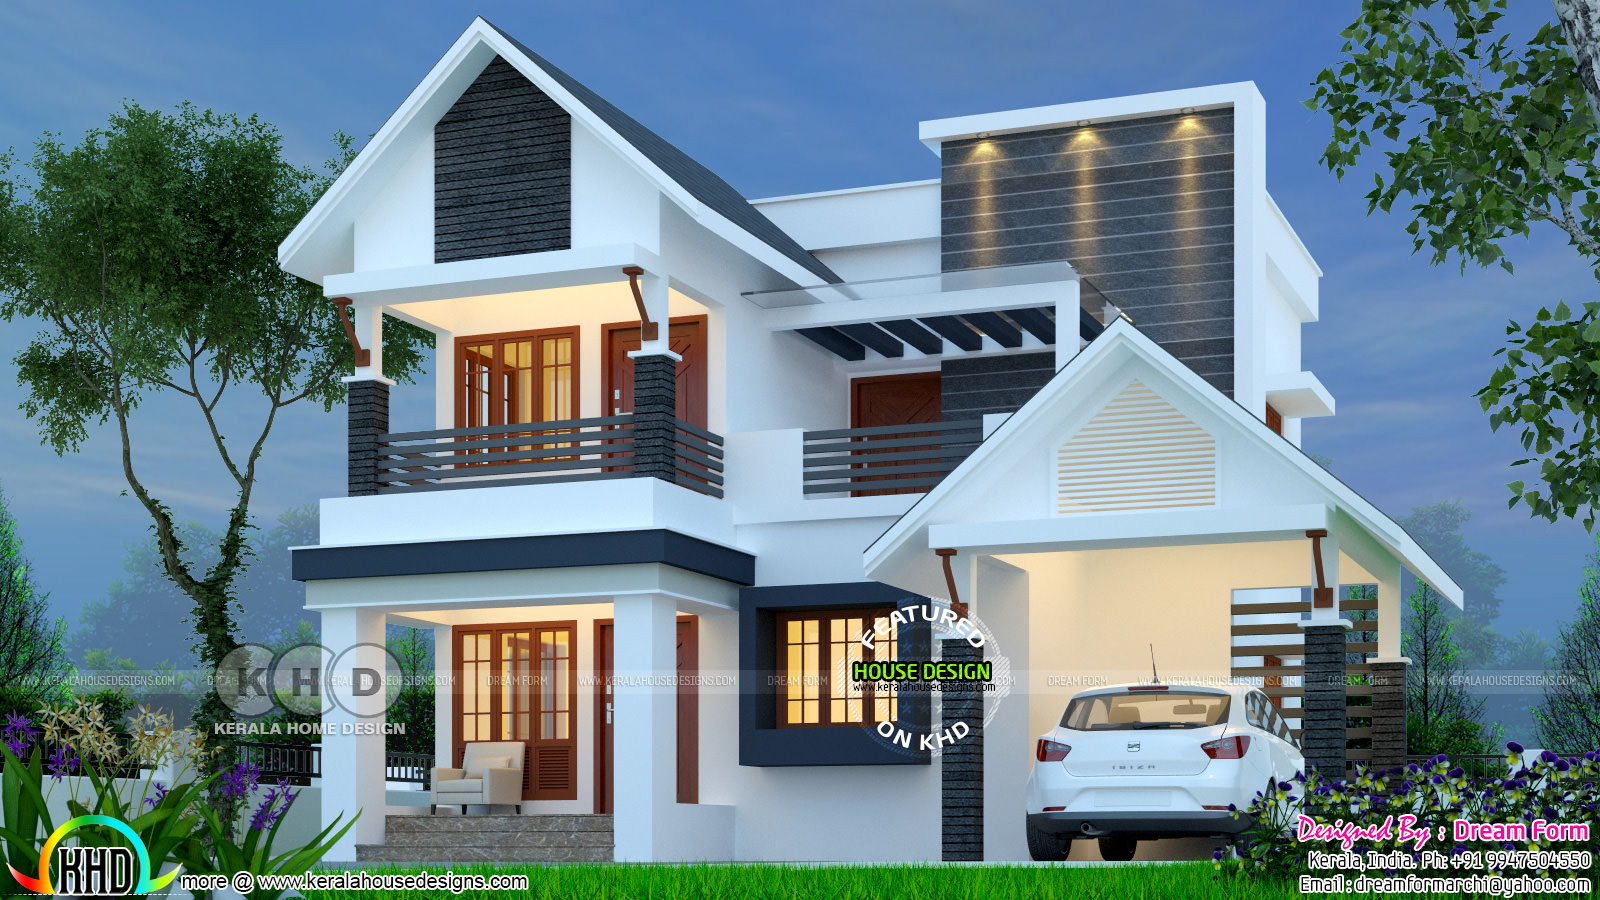 1847 Square Feet 4 Bedroom Home Plan Kerala Home Design